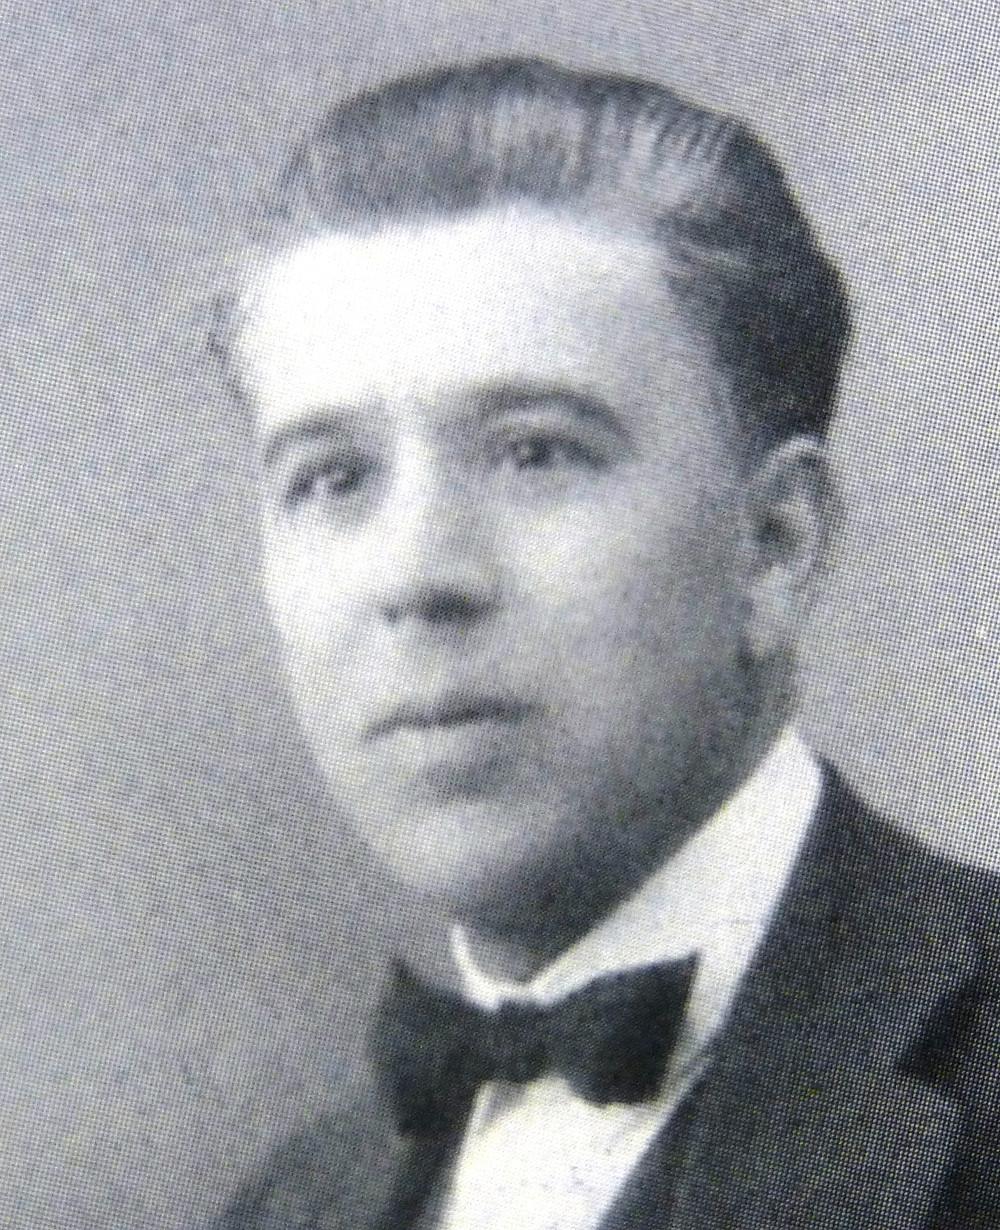 Francisco Roa de la Vega. Gentileza de Wenceslao Álvarez Oblanca.